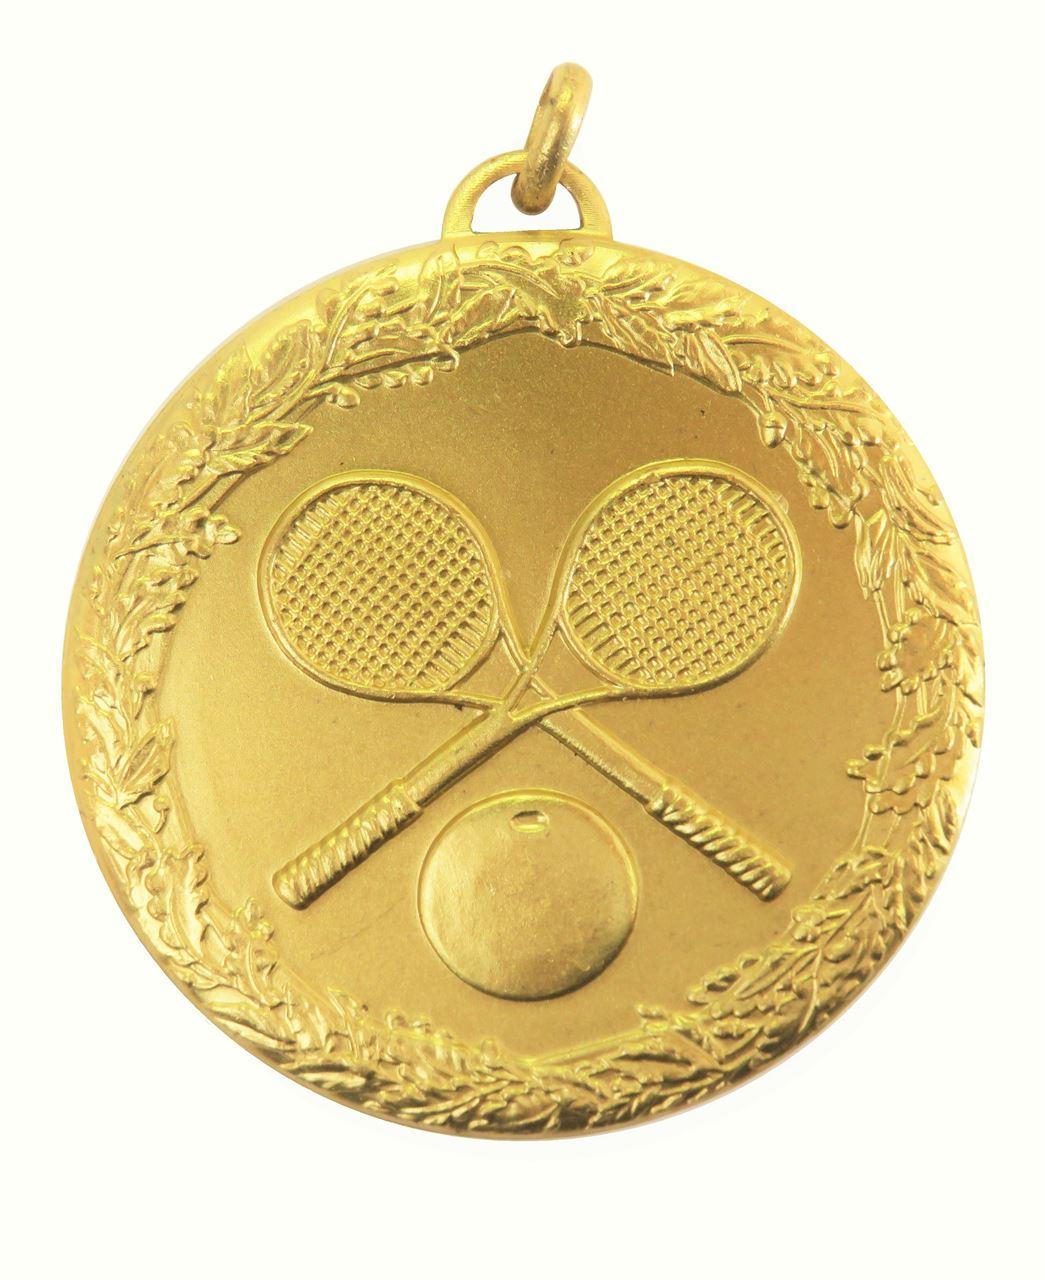 Gold Laurel Economy Squash Medal (size: 50mm) - 5493E